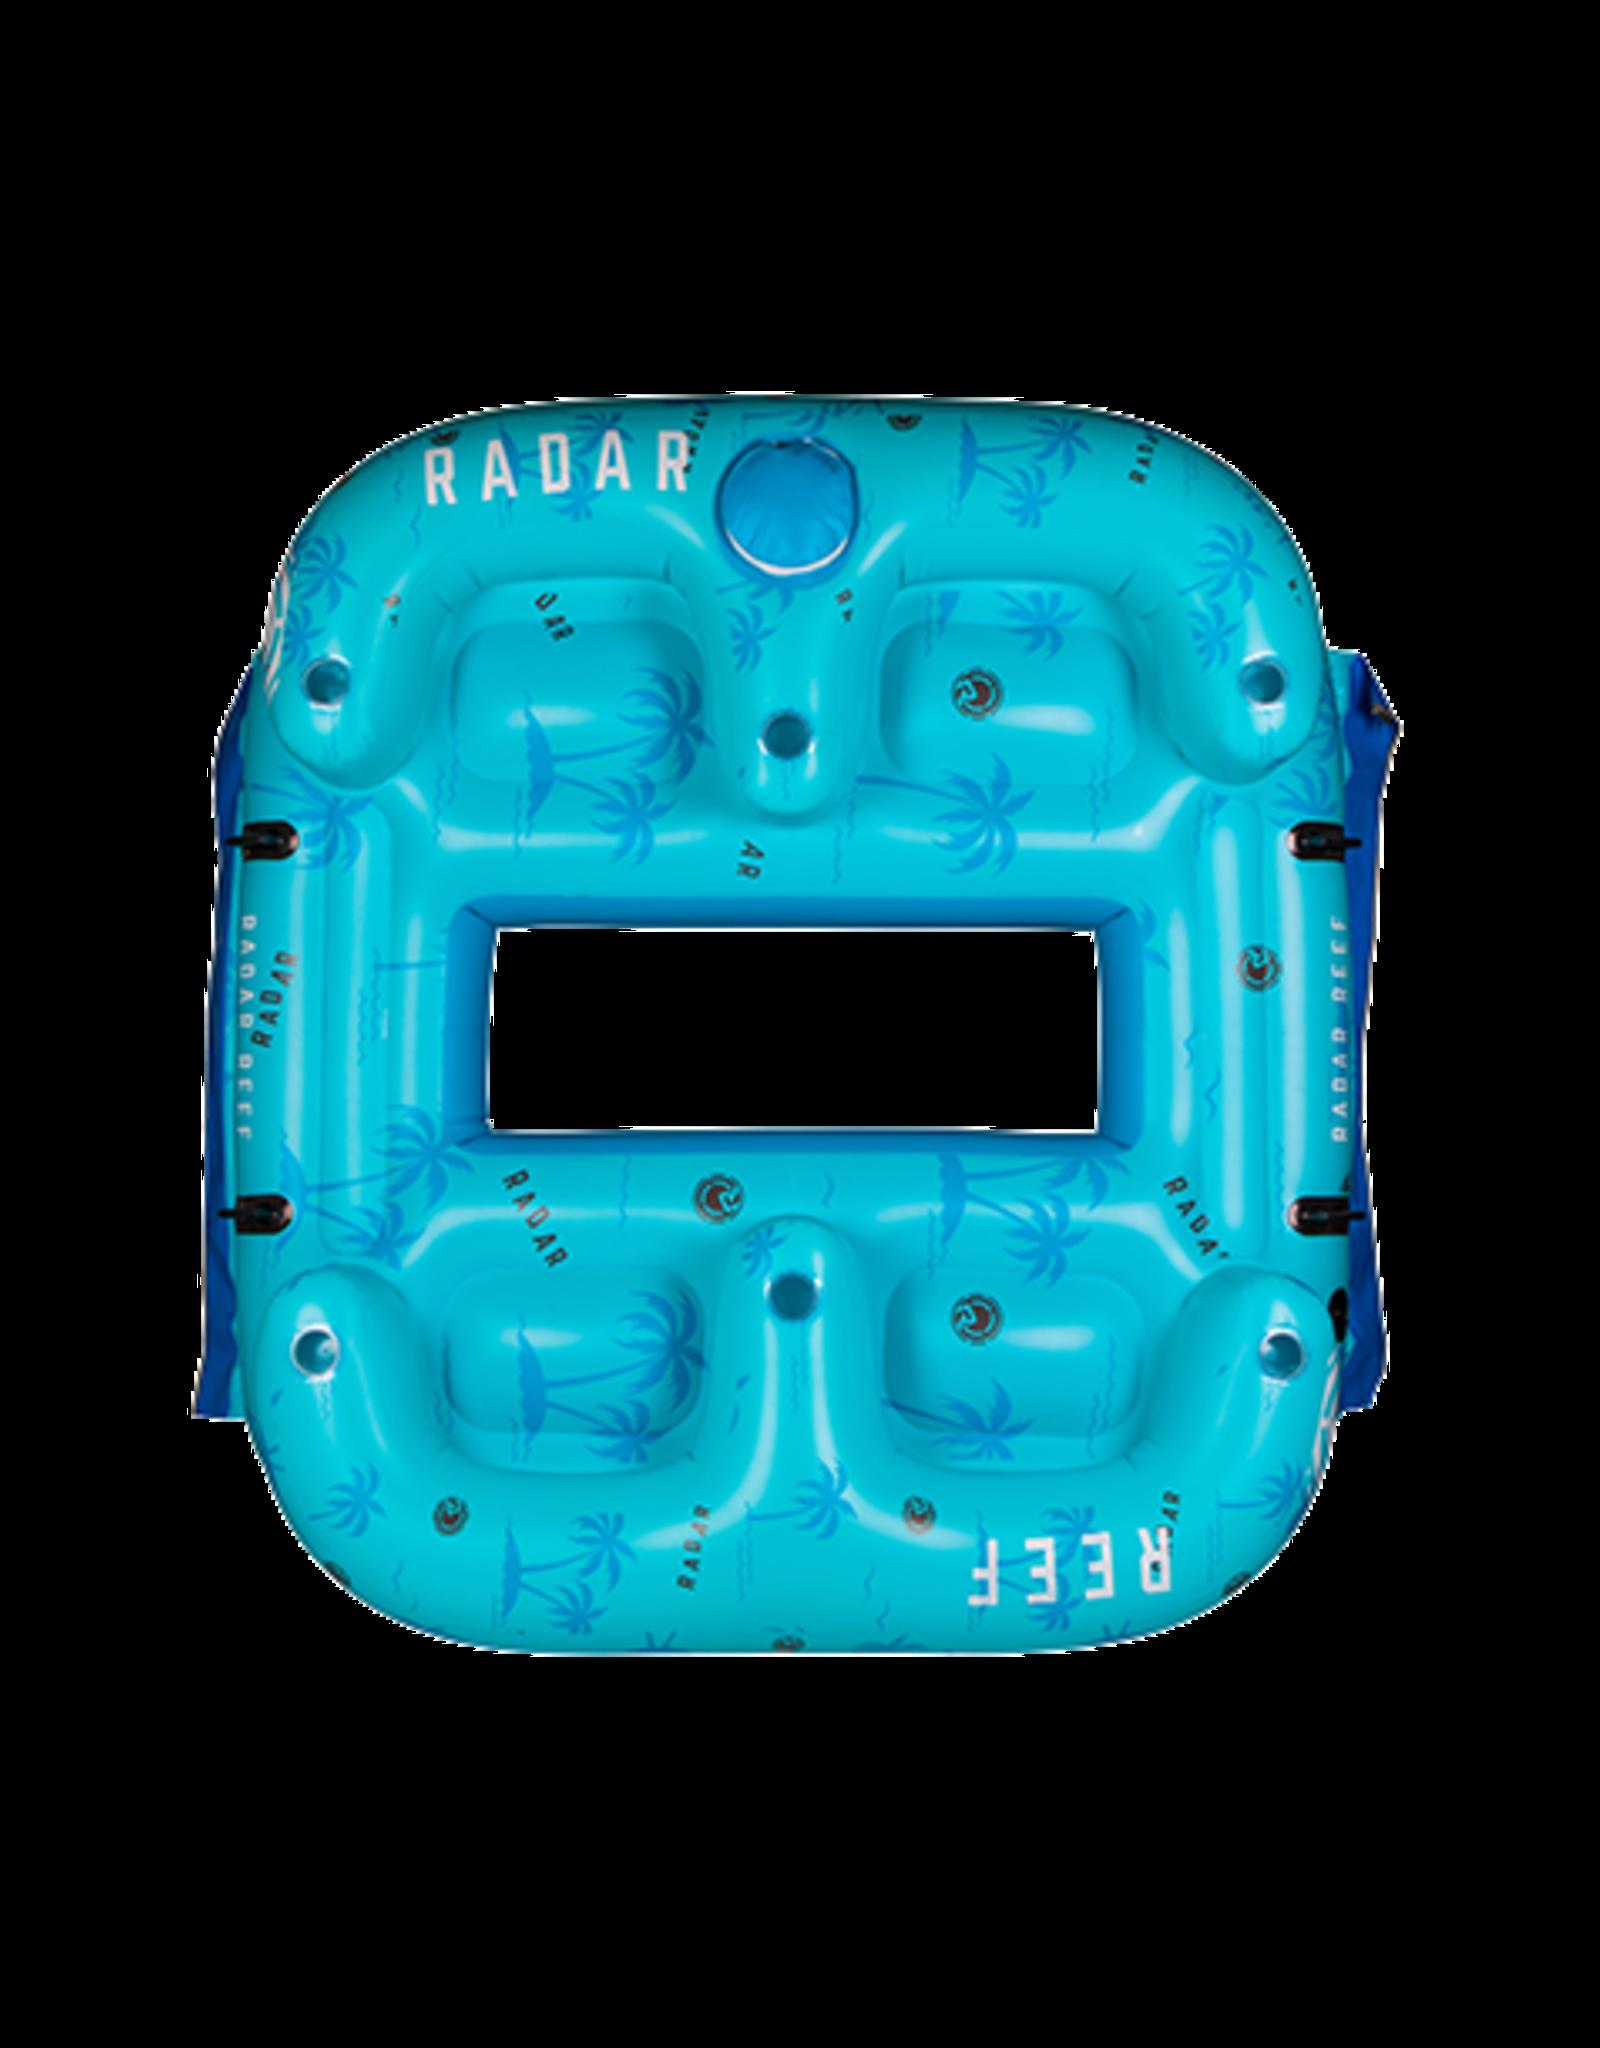 Radar Reef Lounge 4 Person Float